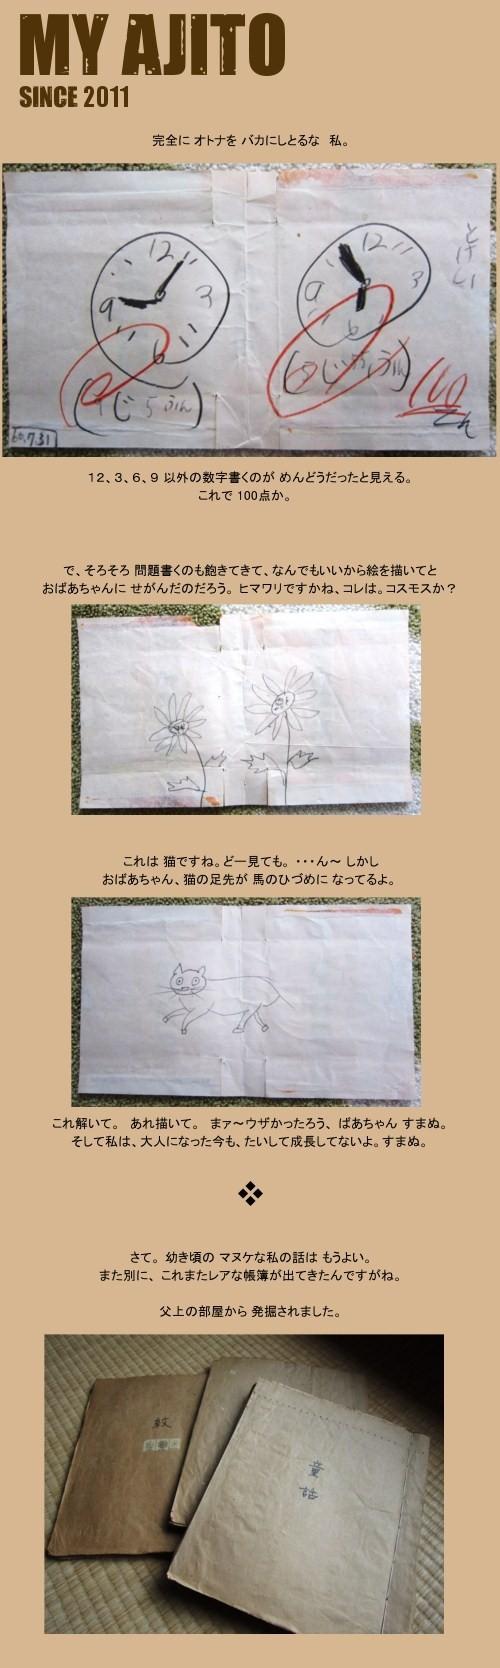 oshiba_3.jpg